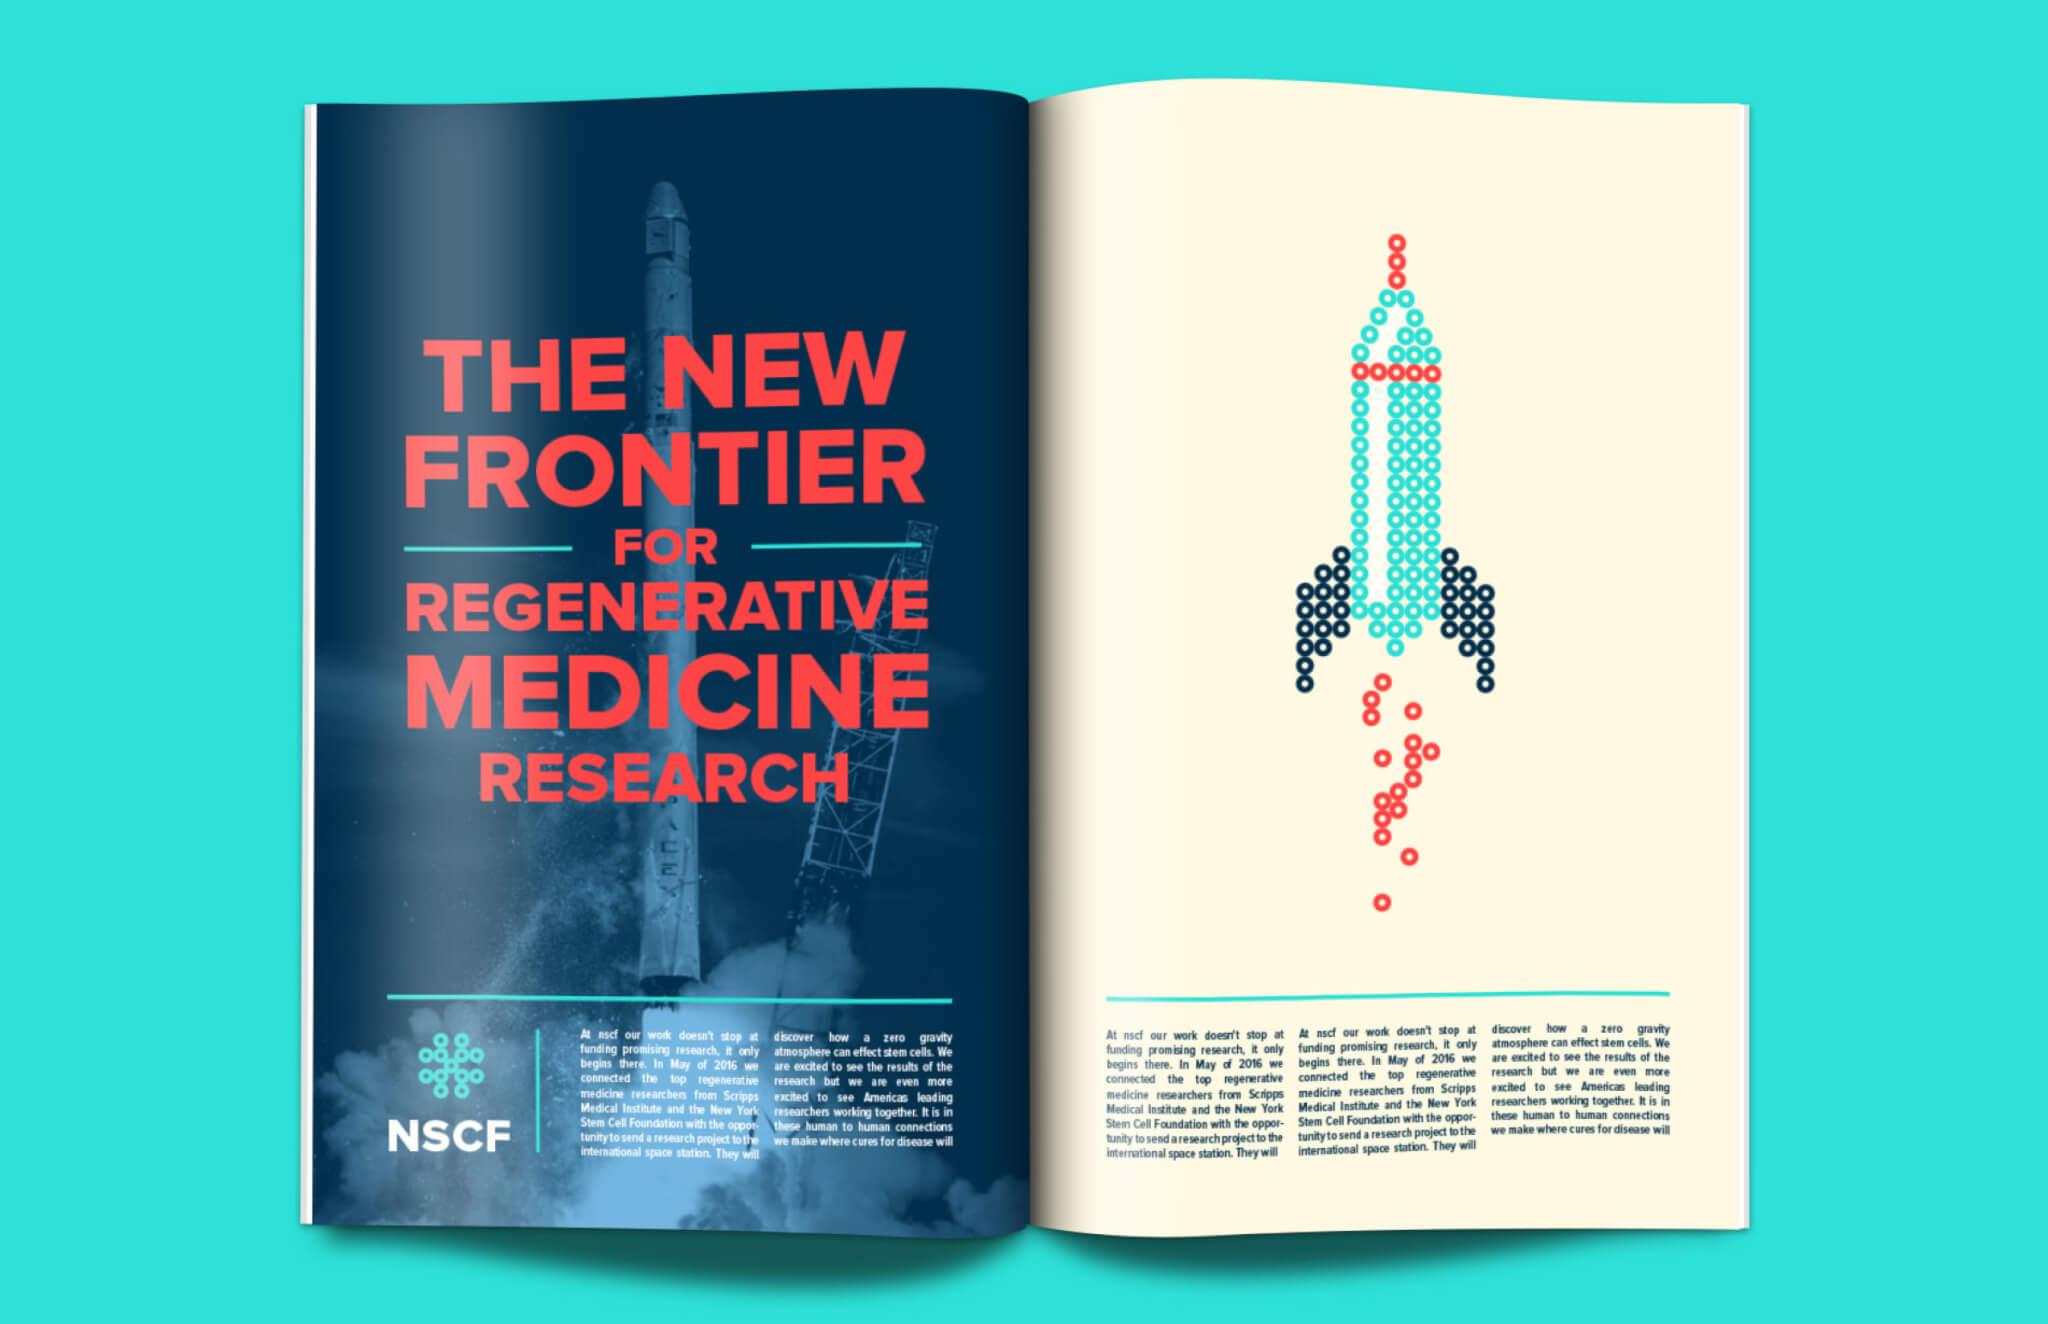 National Stem Cell Foundation Print branding